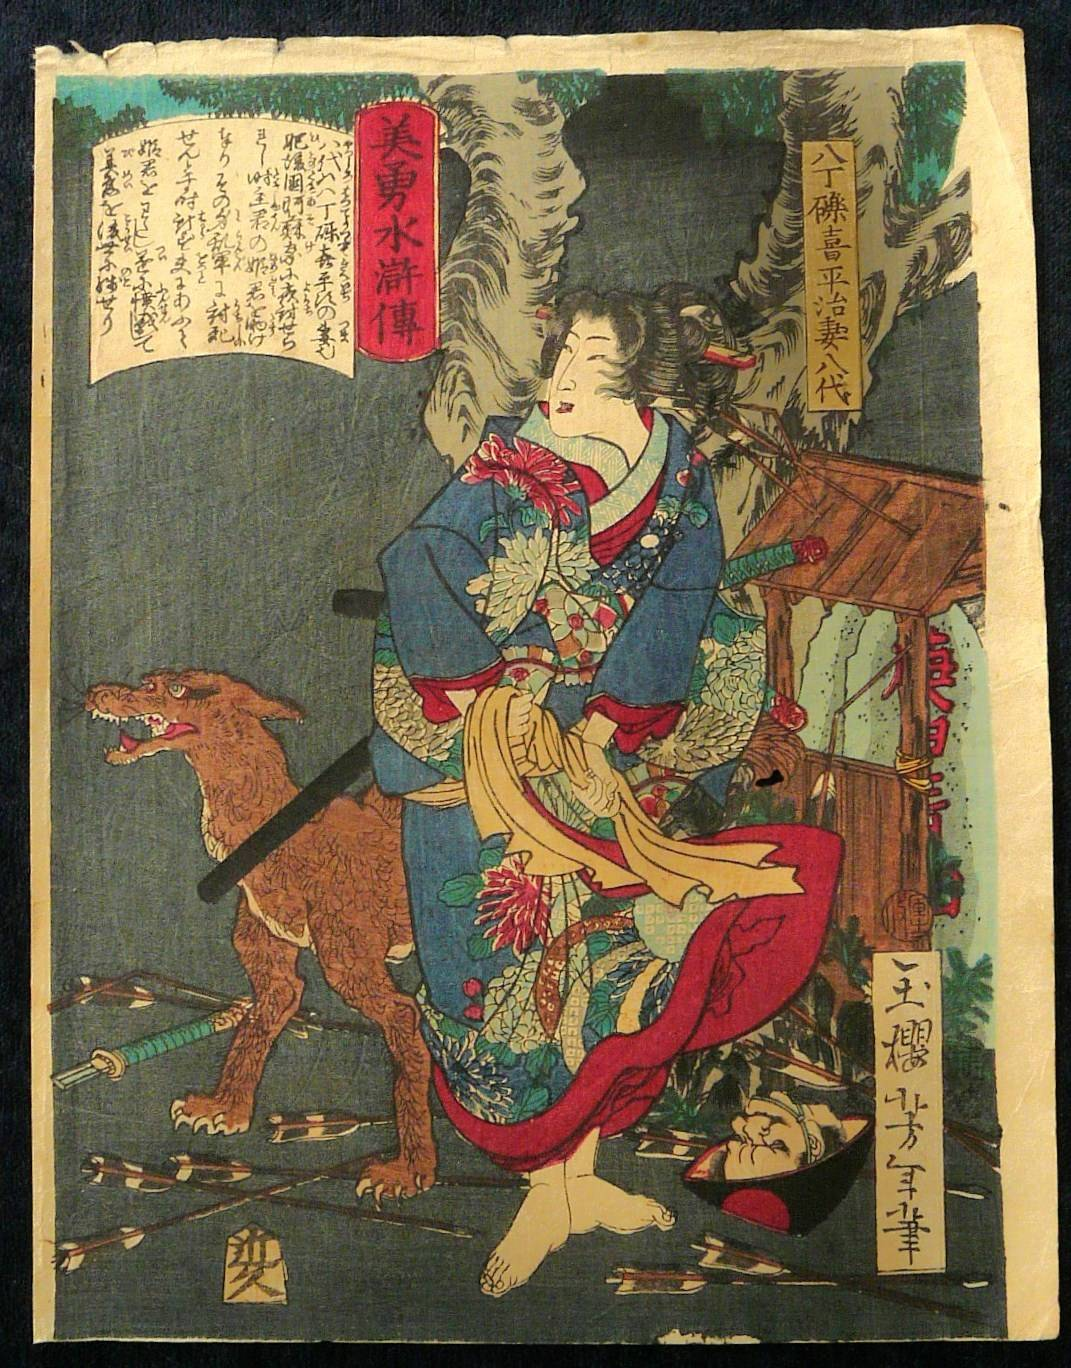 TAISO YOSHITOSHI: #P3972 YATSUSHIRO, THE WIFE OF HATCHOTSUBUTE KIHEIJI WAITS WITH HER DOG AFTER A BATTLETAISO YOSHITOSHI: #P3972 YATSUSHIRO, THE WIFE OF HATCHOTSUBUTE KIHEIJI WAITS WITH HER DOG AFTER A BATTLE, No 22 IN THE SERIES BIYU SUIKODEN